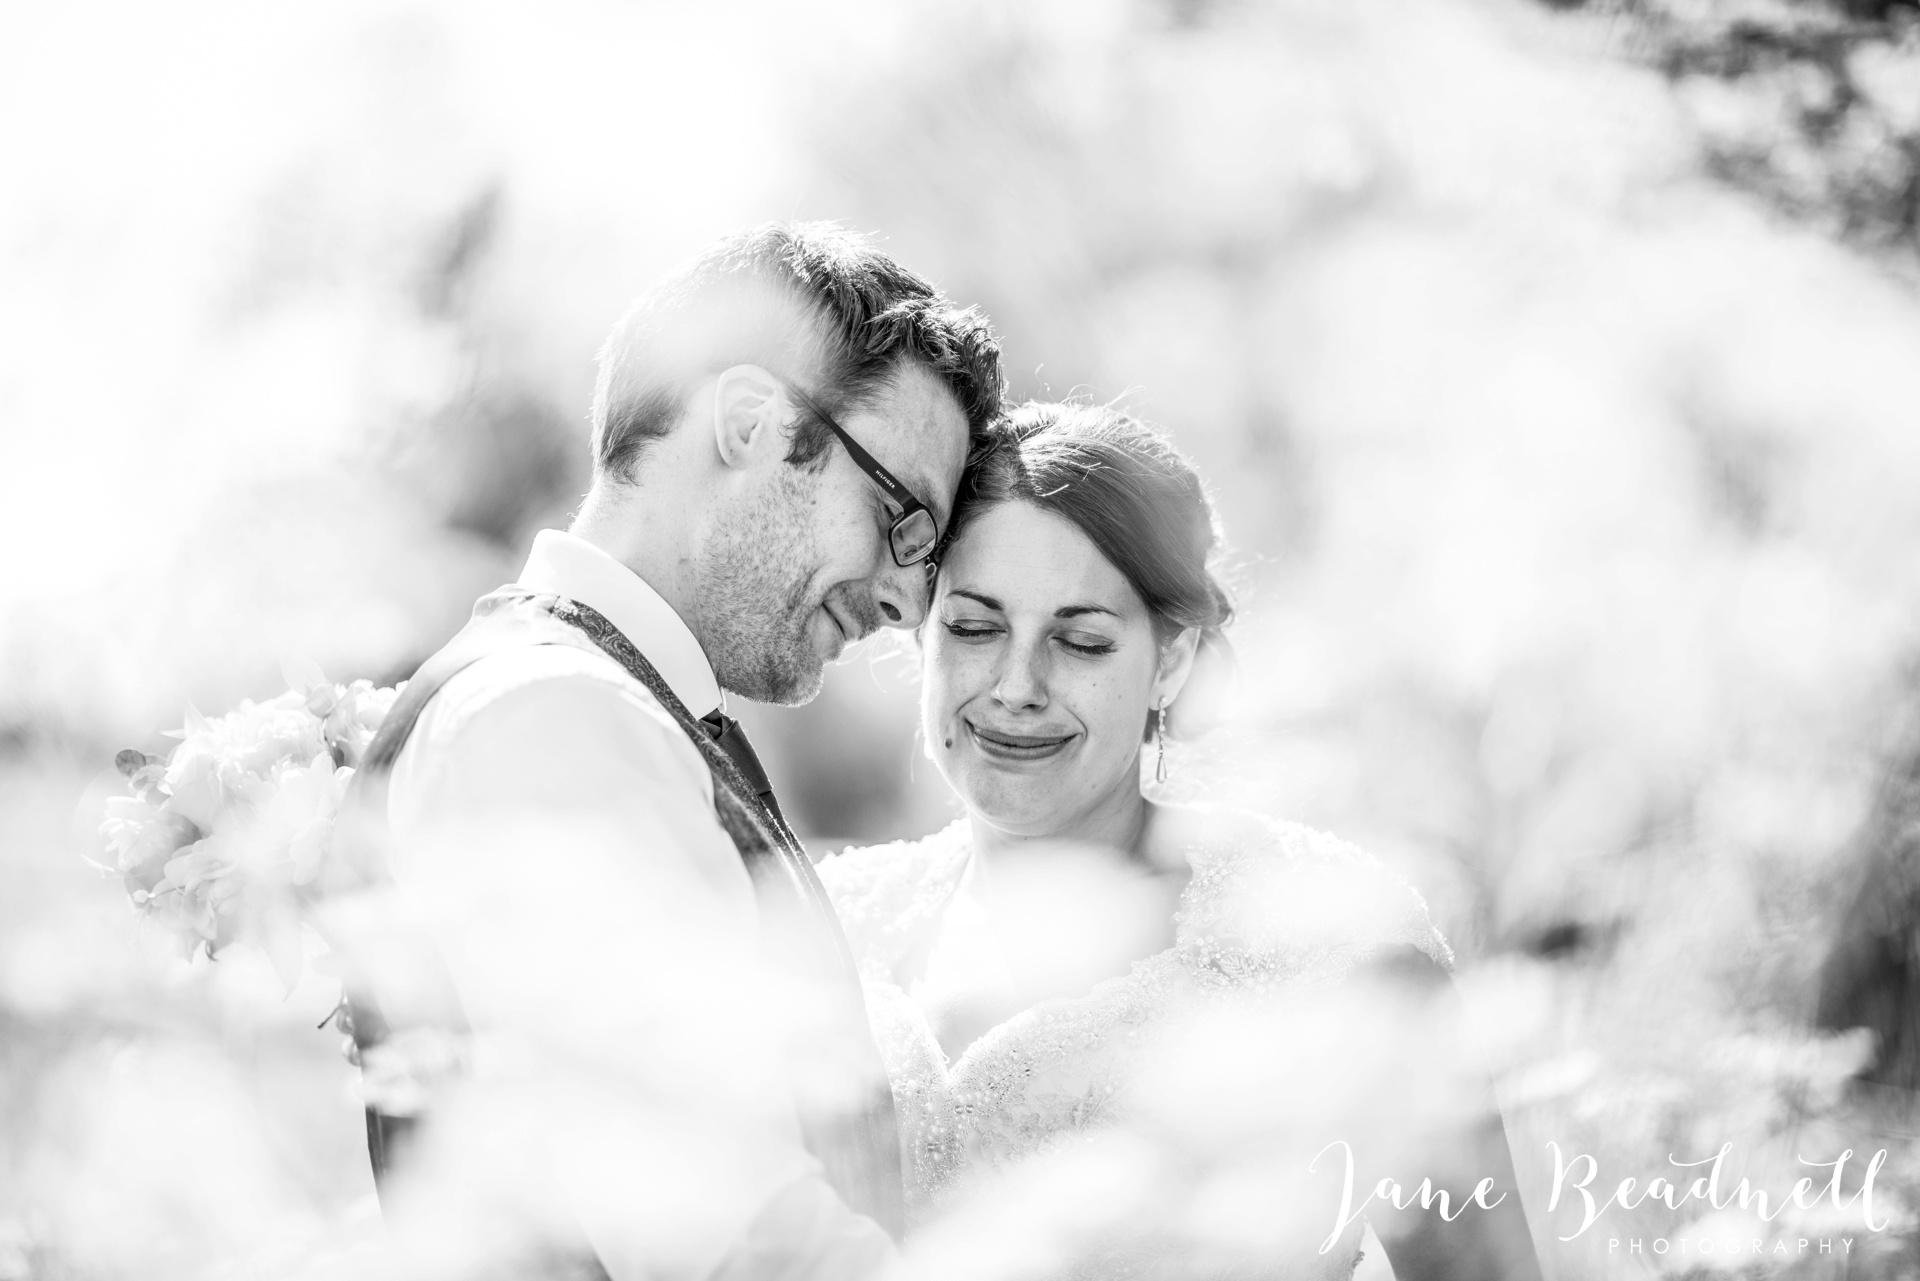 Bath Abbey wedding photography by fine art wedding photographer Leeds Jane Beadnell_51